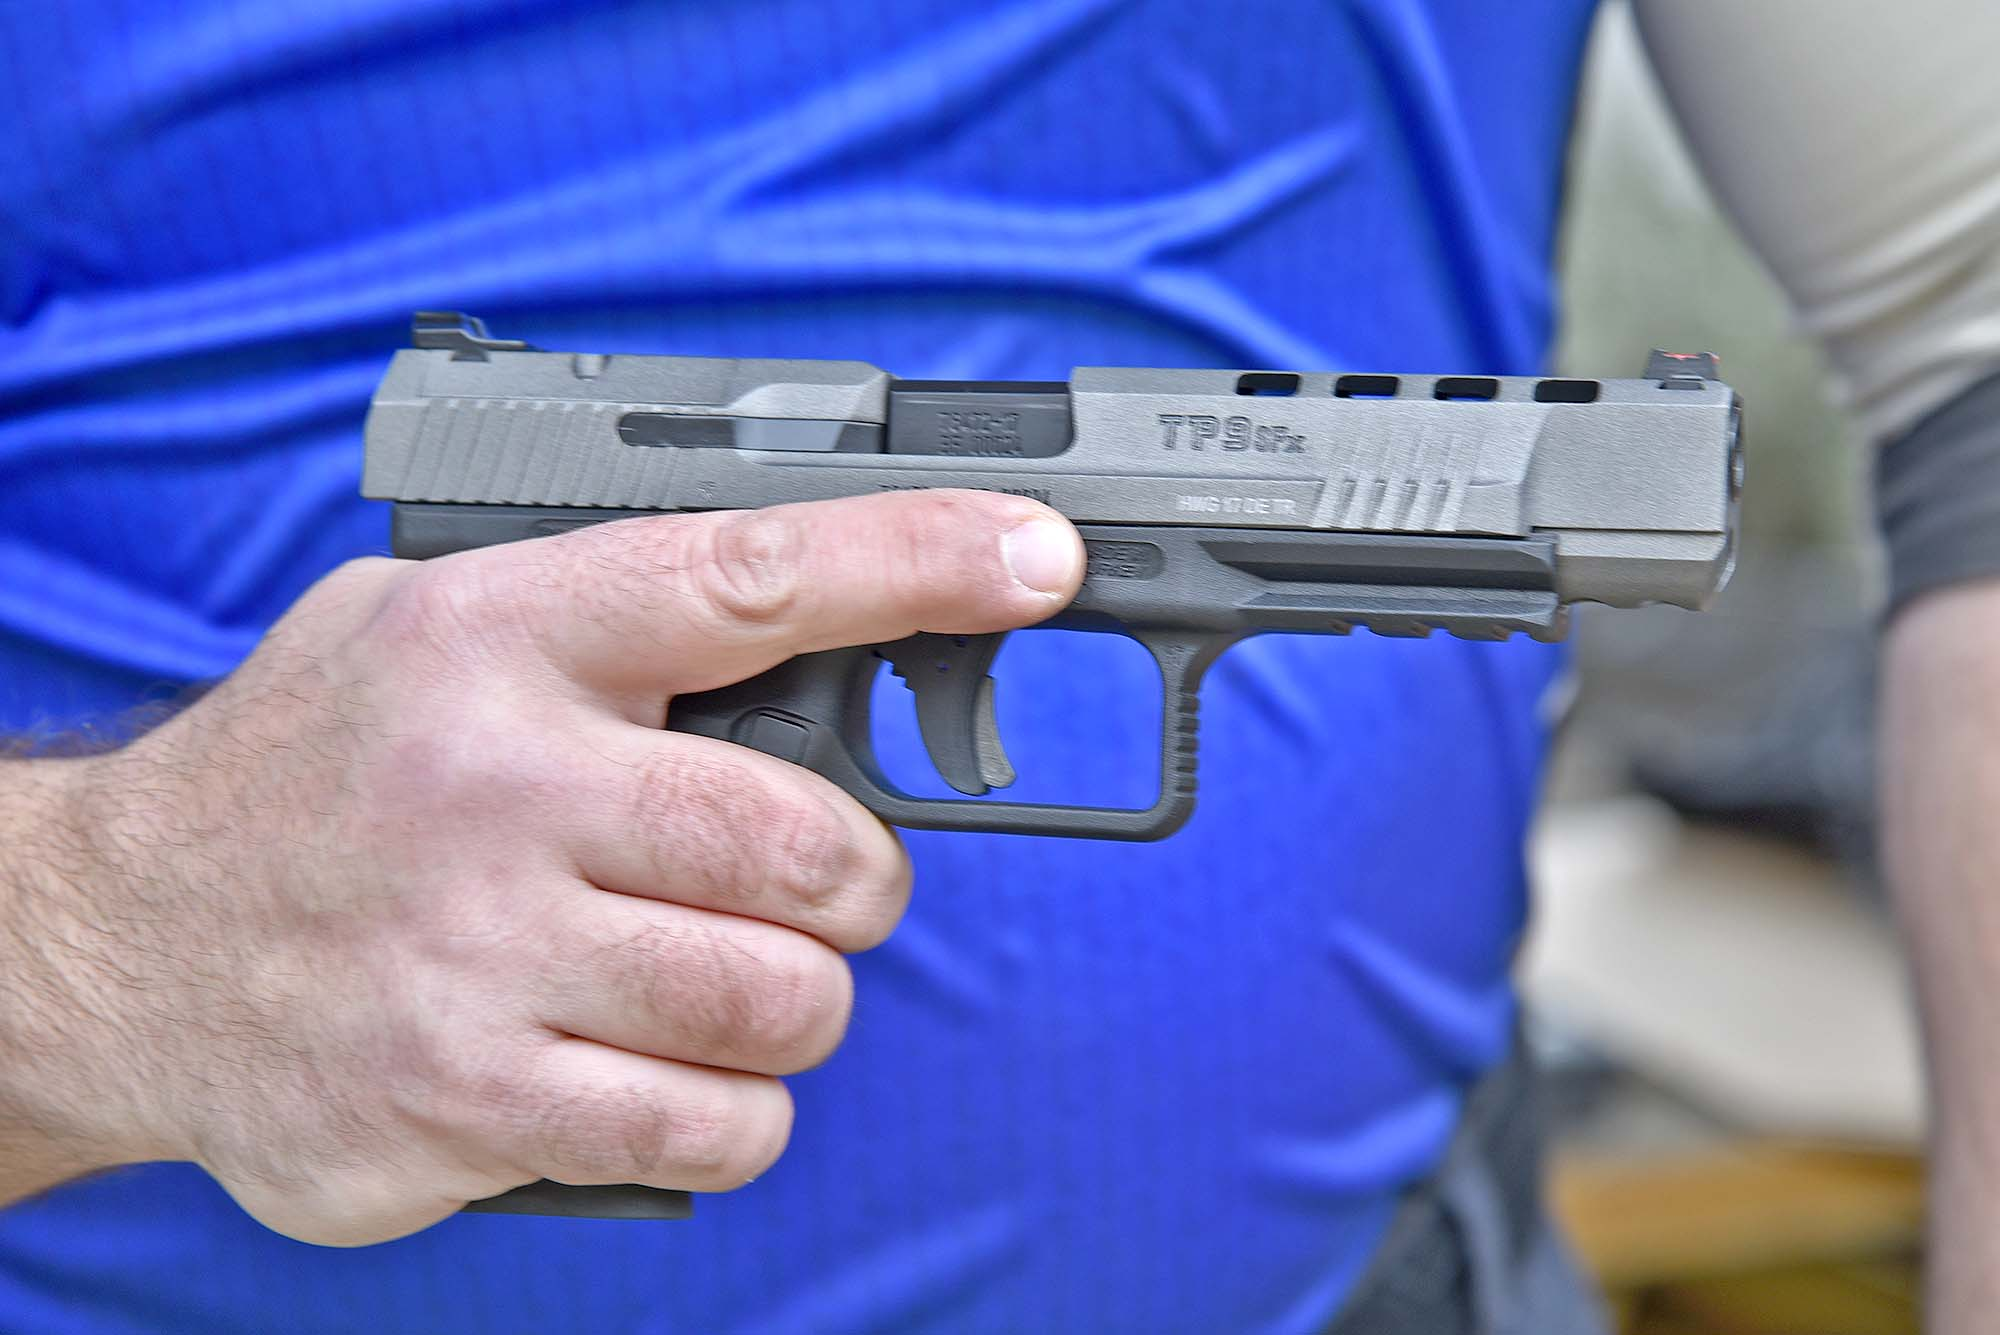 The Canik TP9SFx is the Handgun of the Year 2017! | GUNSweek com